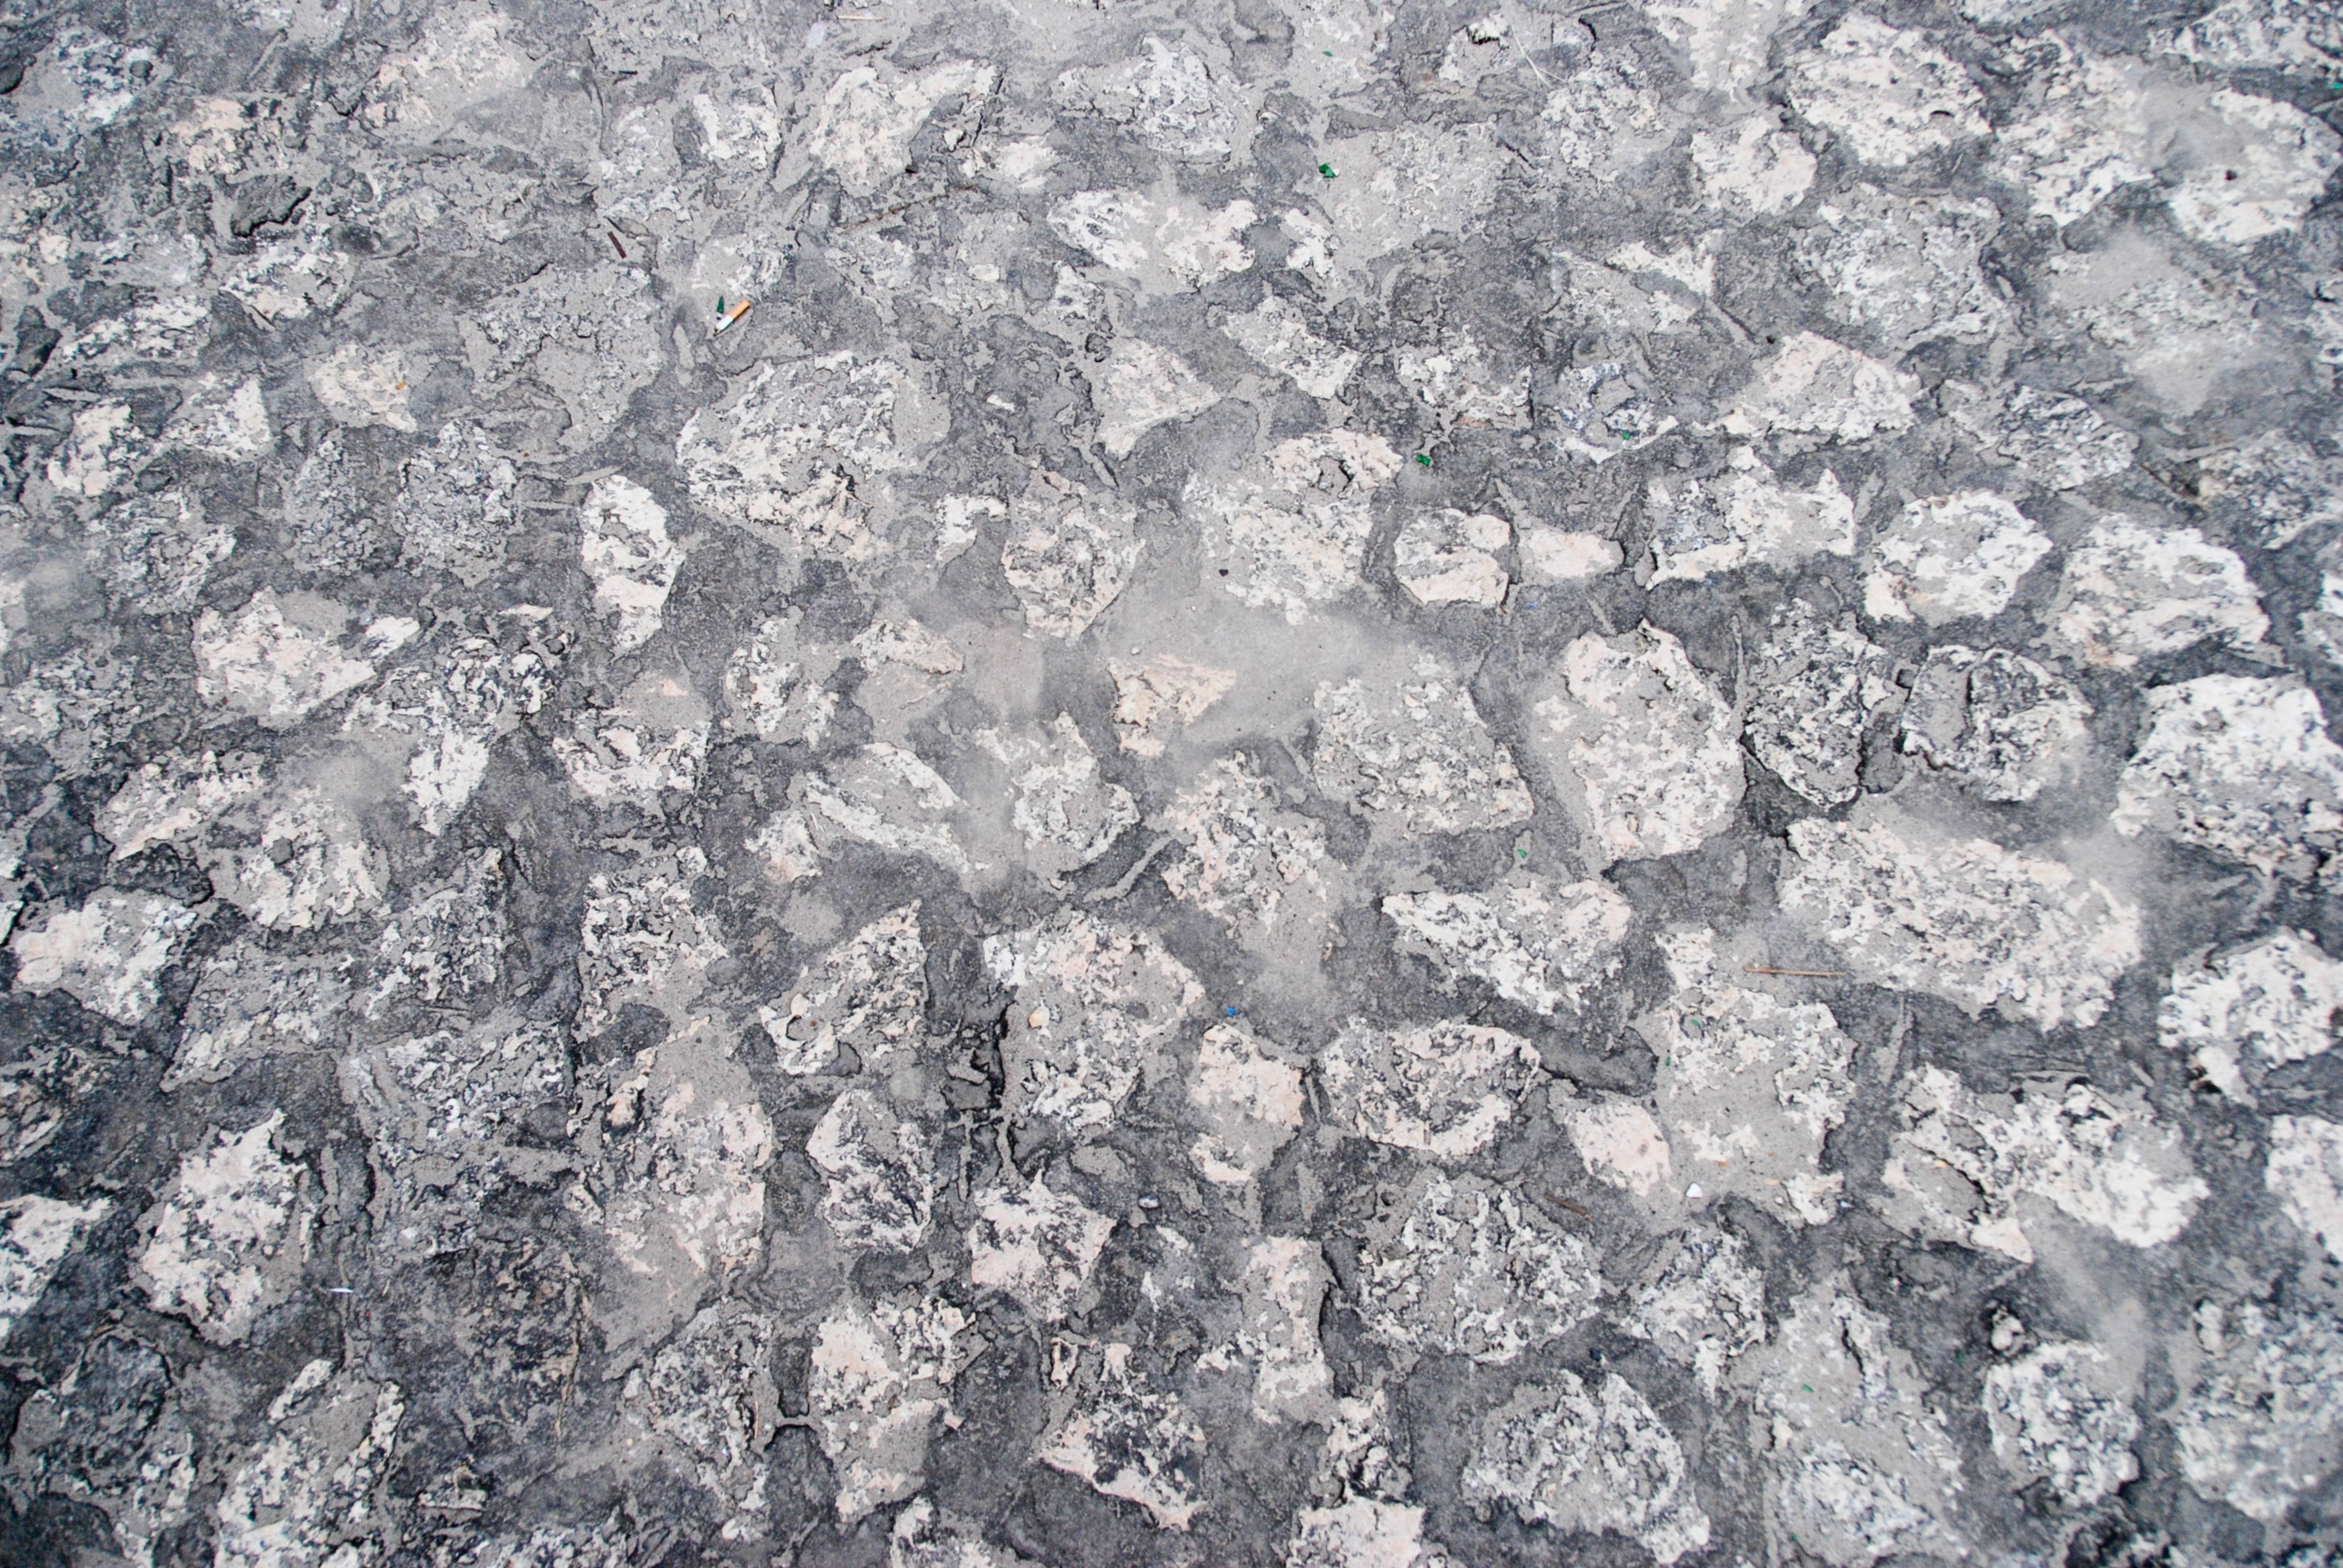 Stone Floor wallpaper background free photo